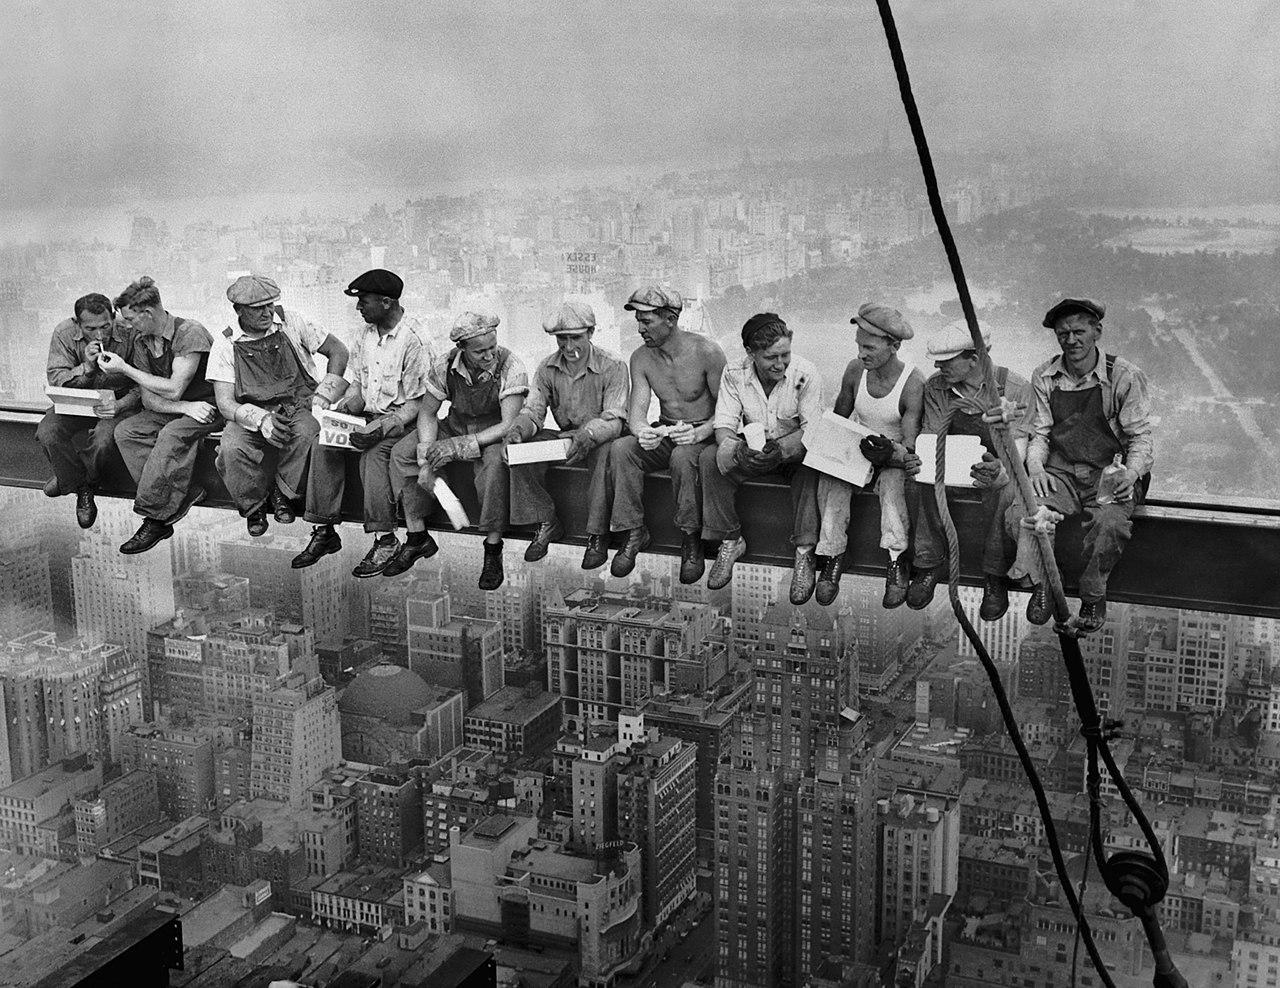 Lunch atop a skyscraper in 1932.